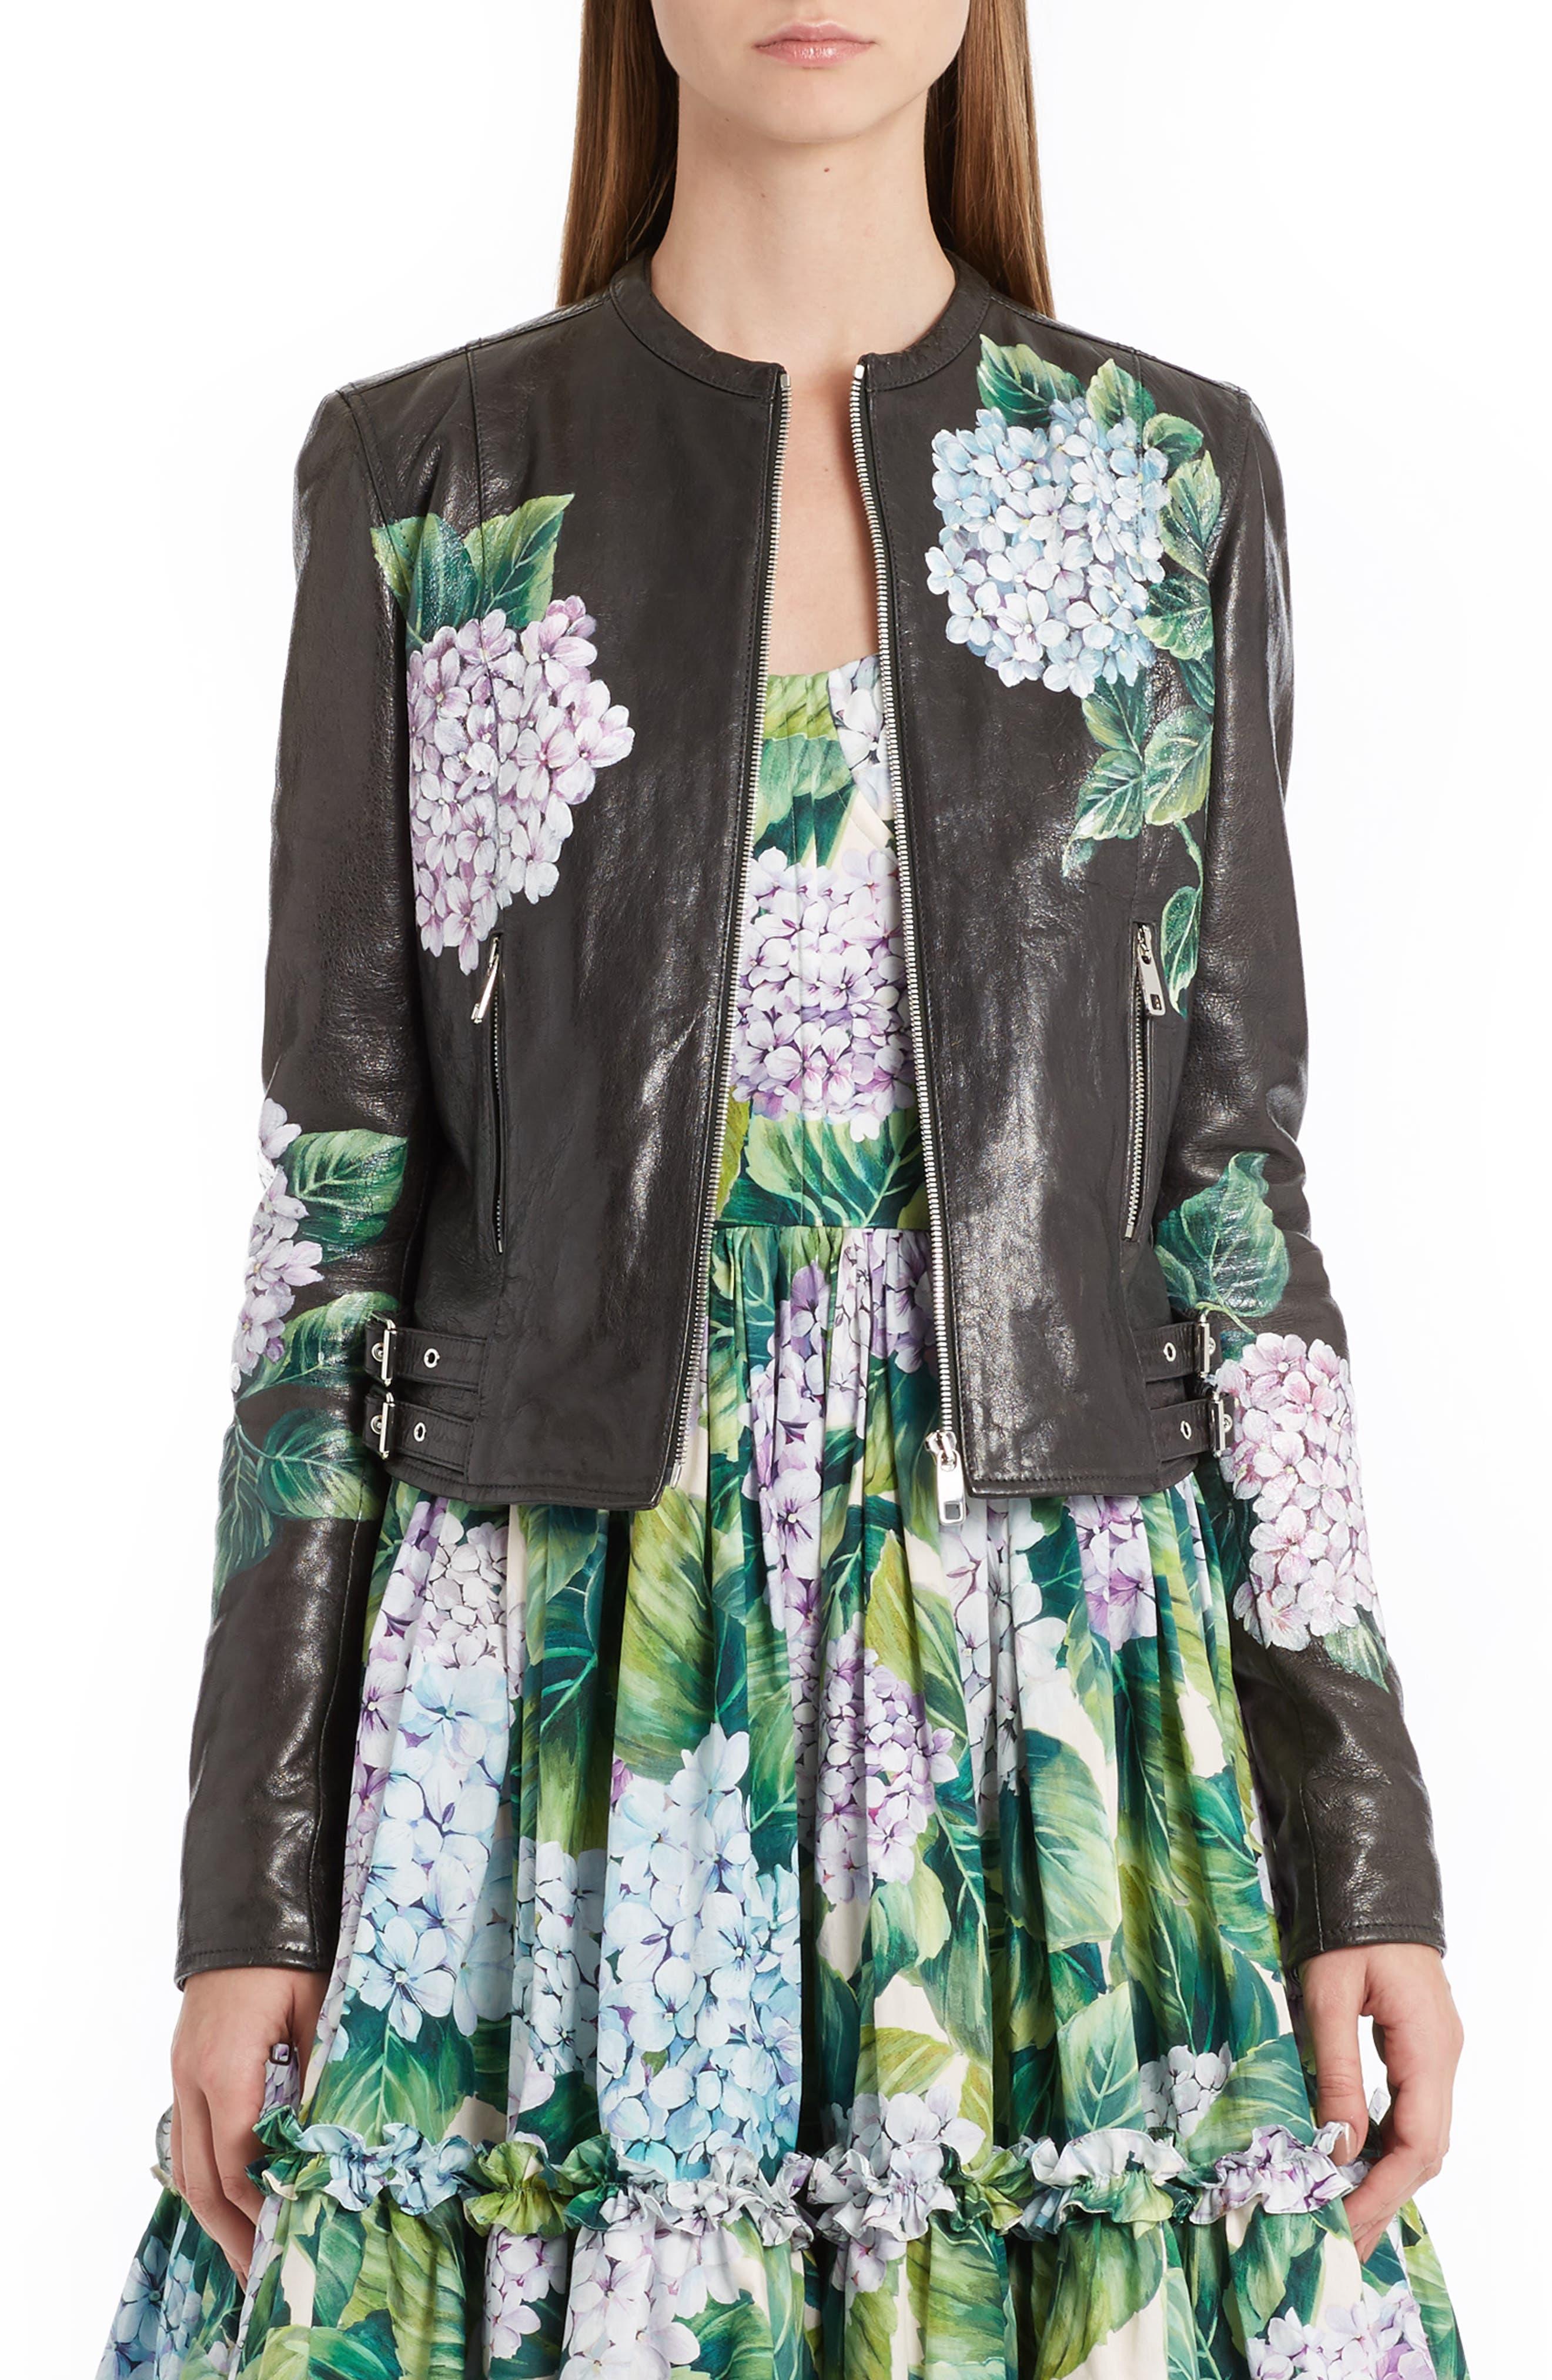 Dolce&Gabbana Hydrangea Painted Leather Jacket